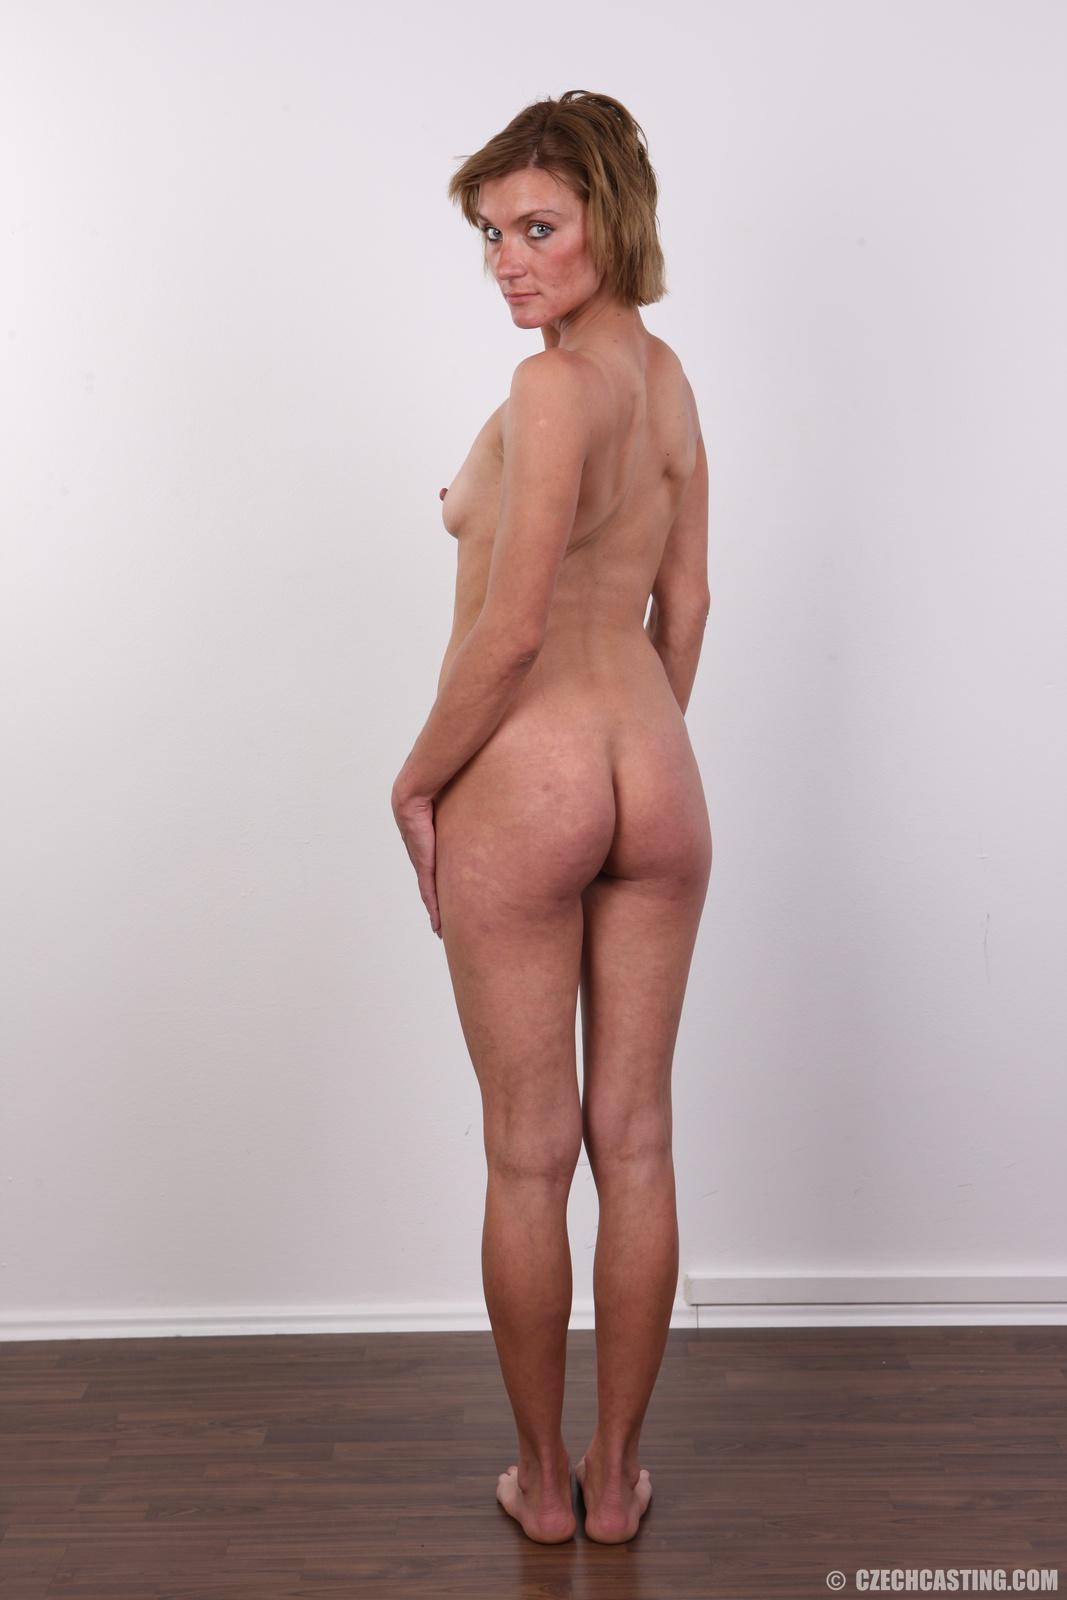 sex olomouc czech casting denisa